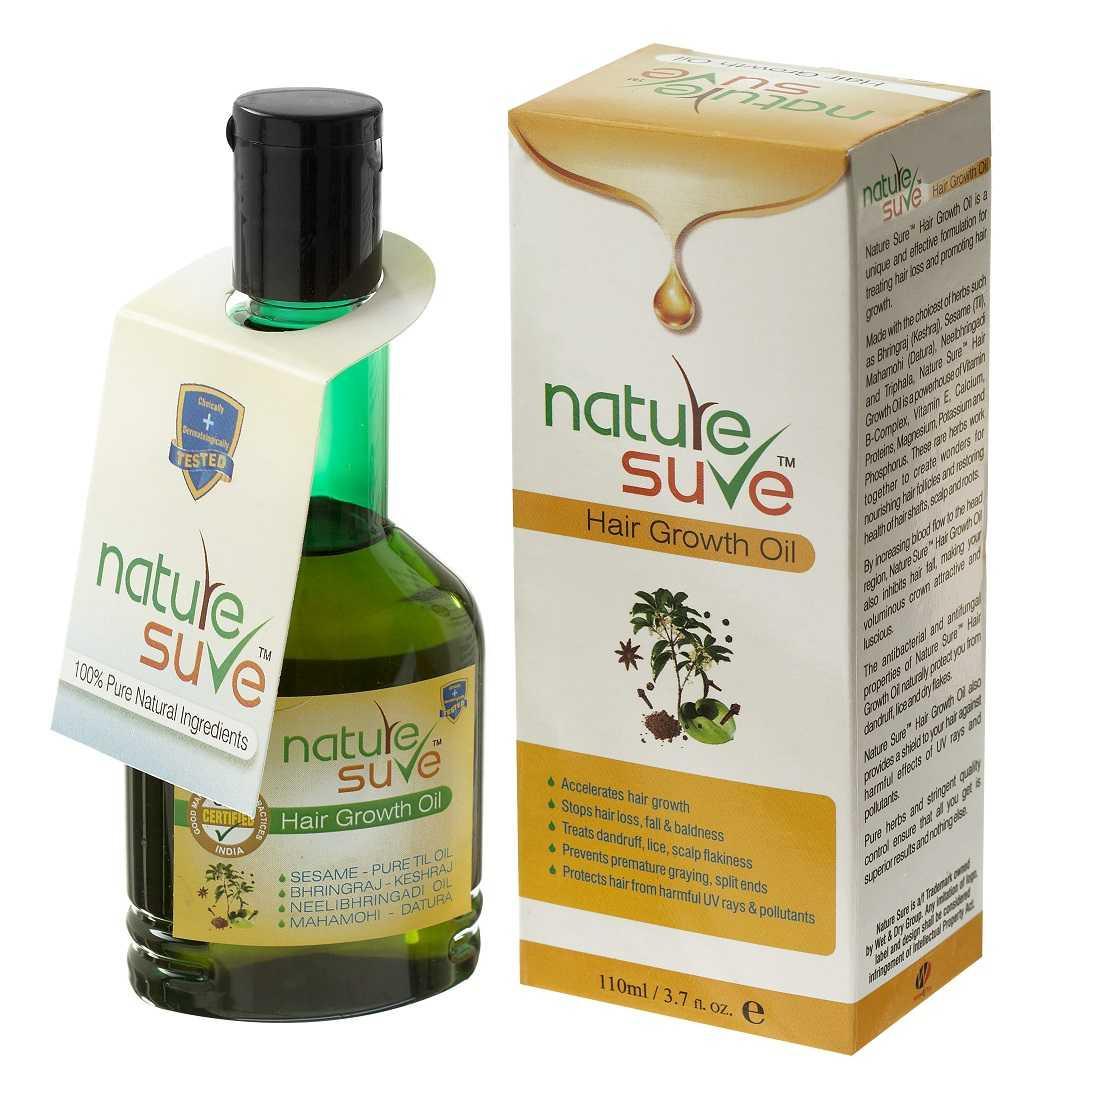 Nature Sure™ Hair Growth Oil - For Hair Fall, Hair Loss, Dandruff, Graying, Split-Ends